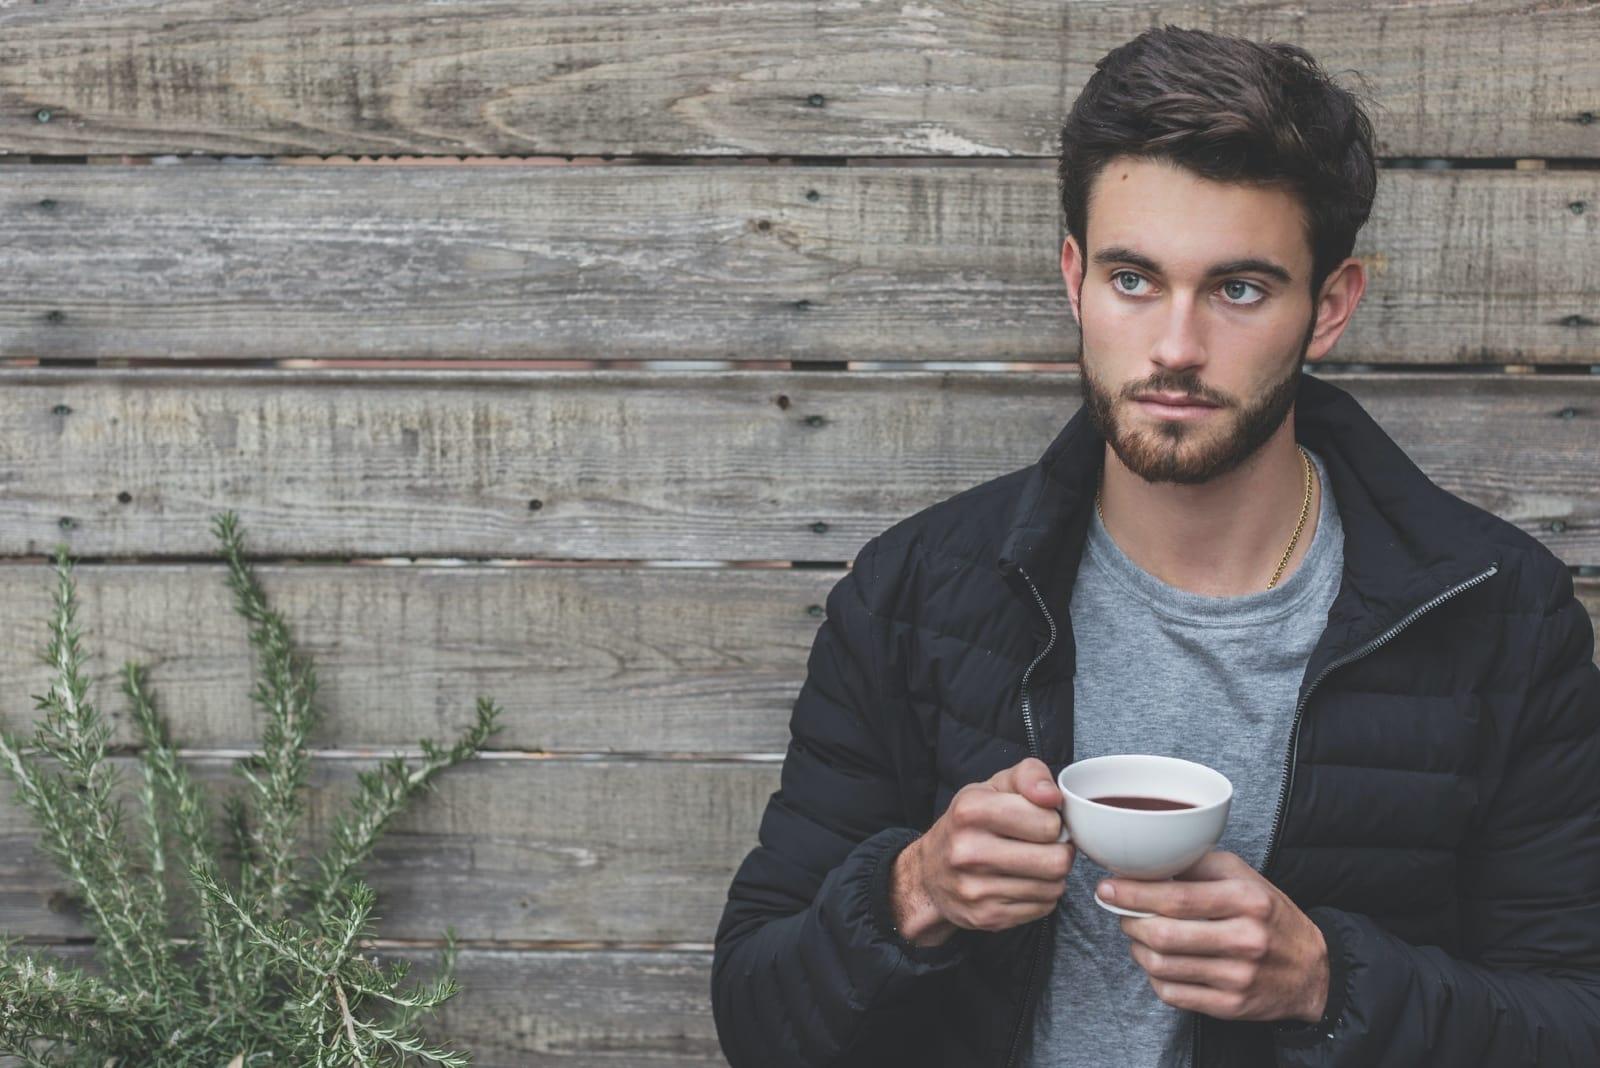 man having coffee while sitting near wall